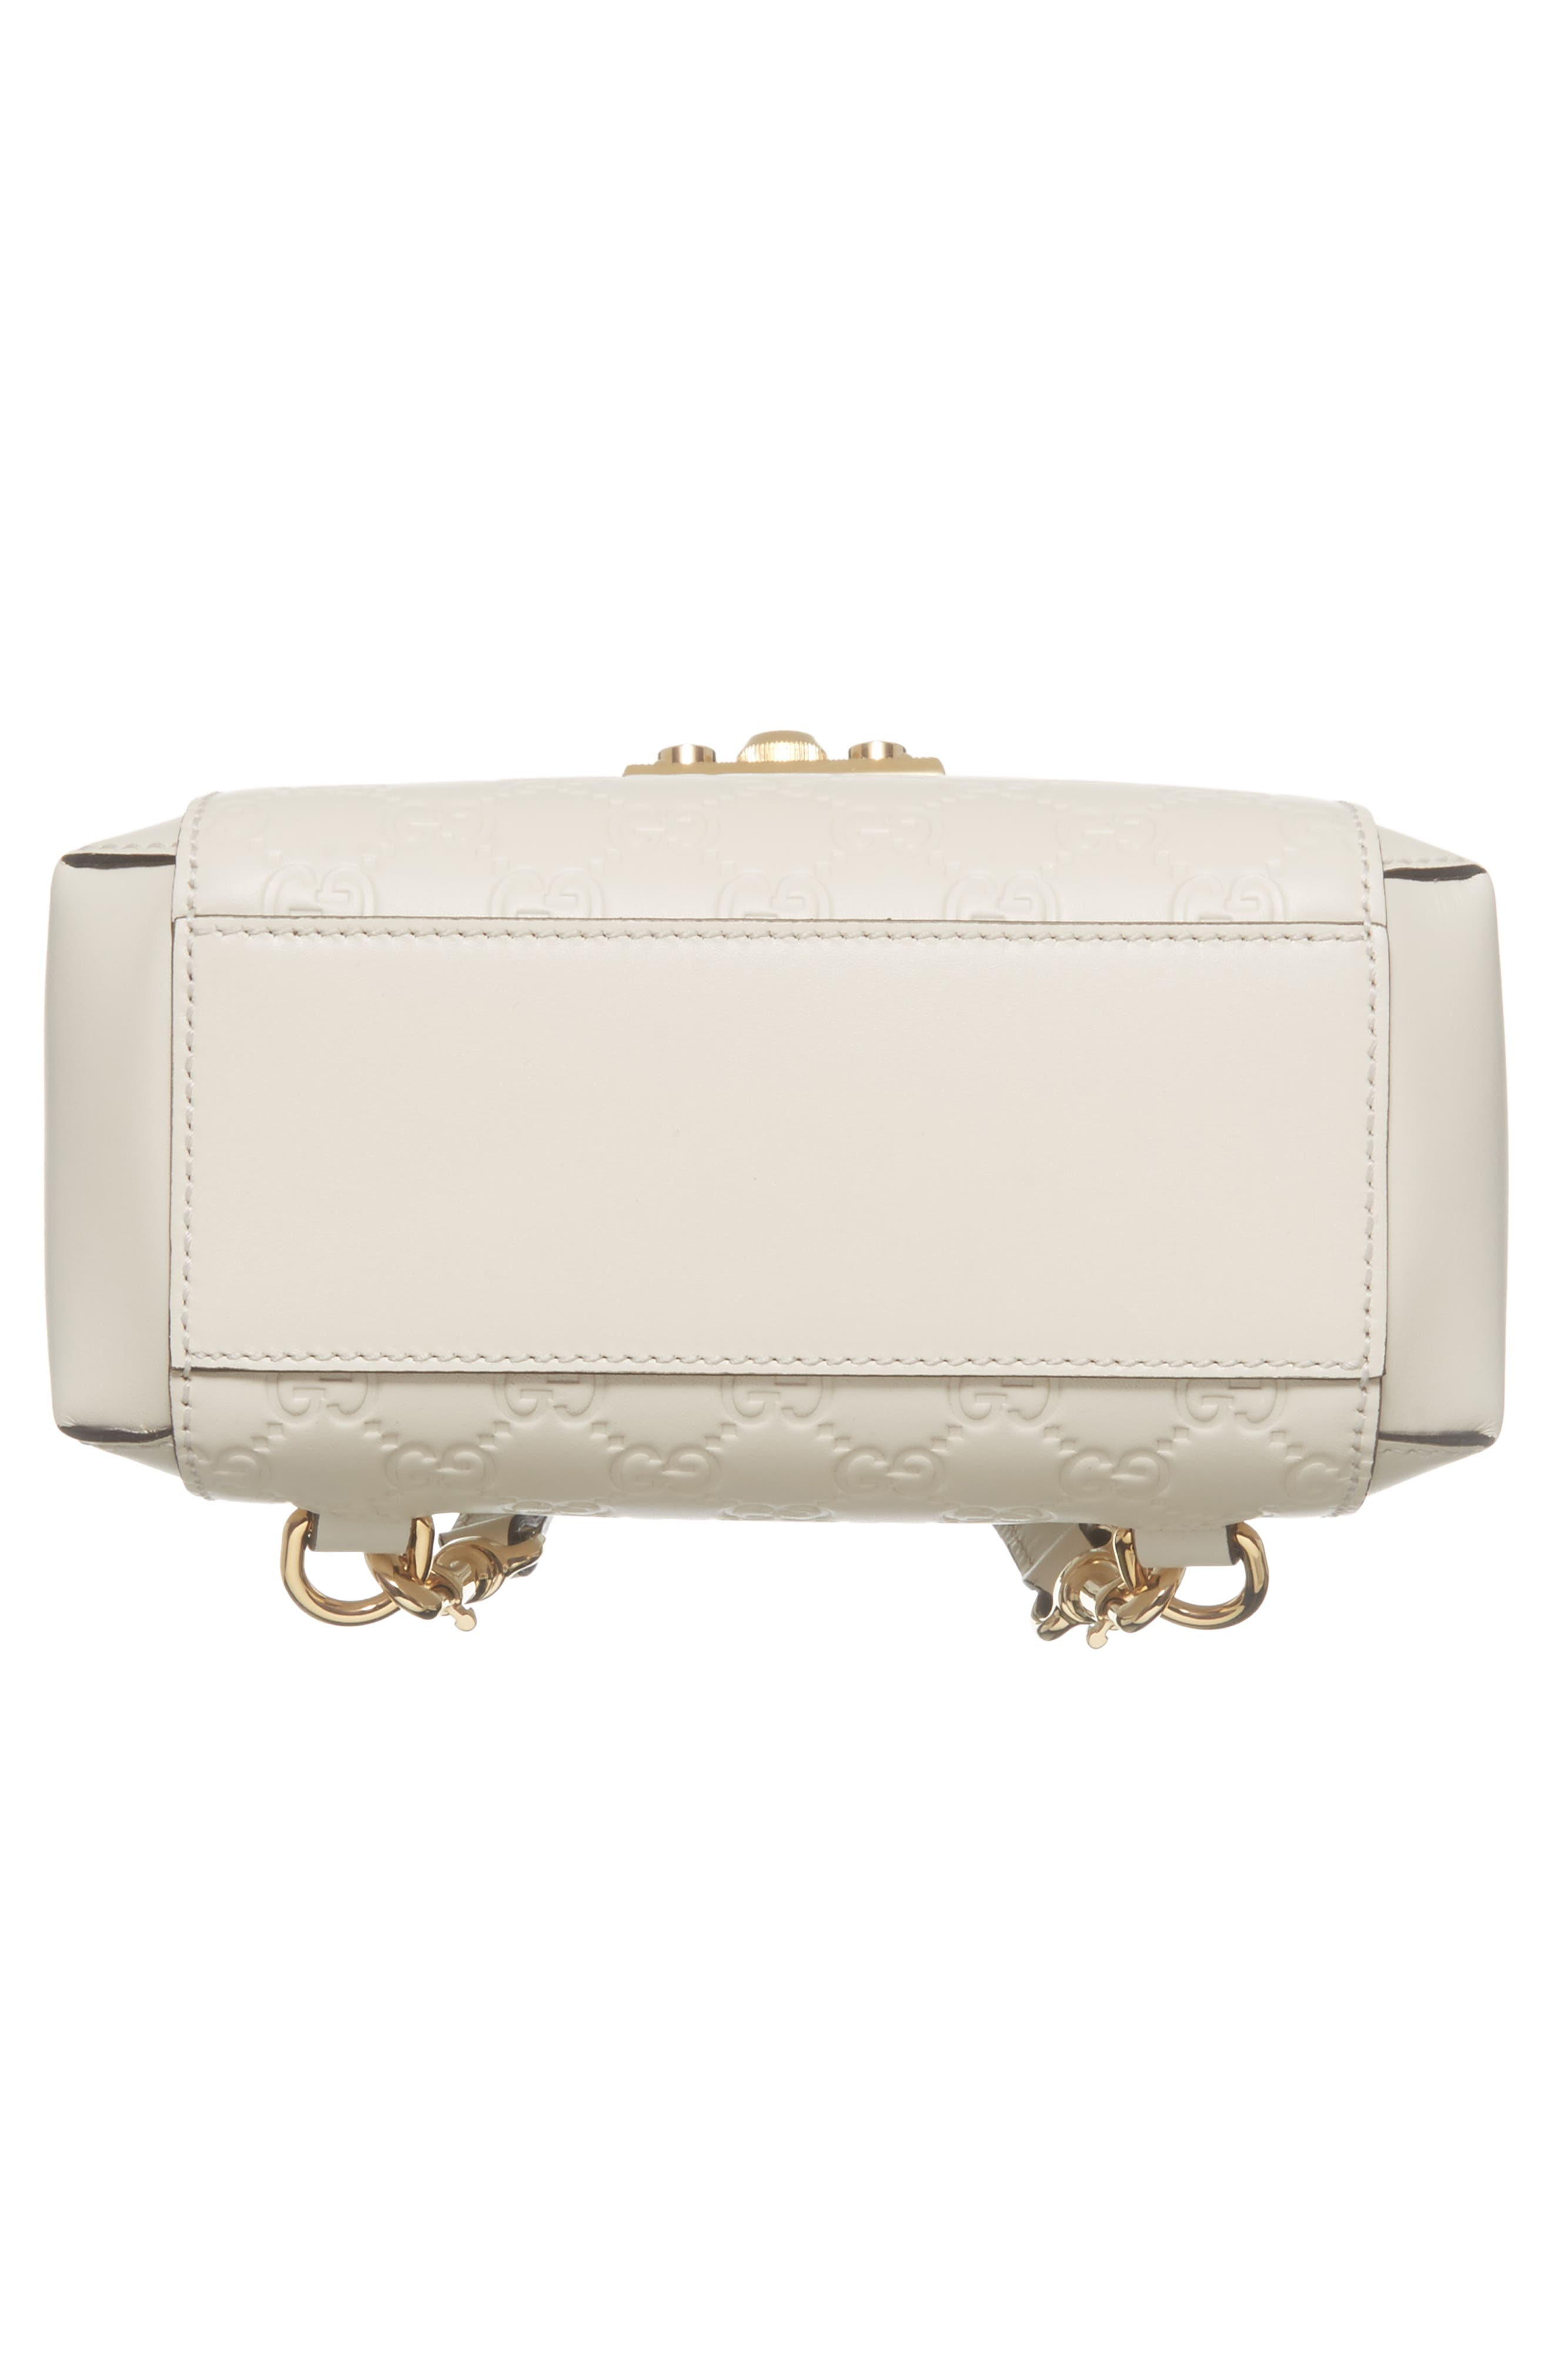 GG Supreme Leather Padlock Backpack,                             Alternate thumbnail 6, color,                             MYSTIC WHITE/ MYSTIC WHITE